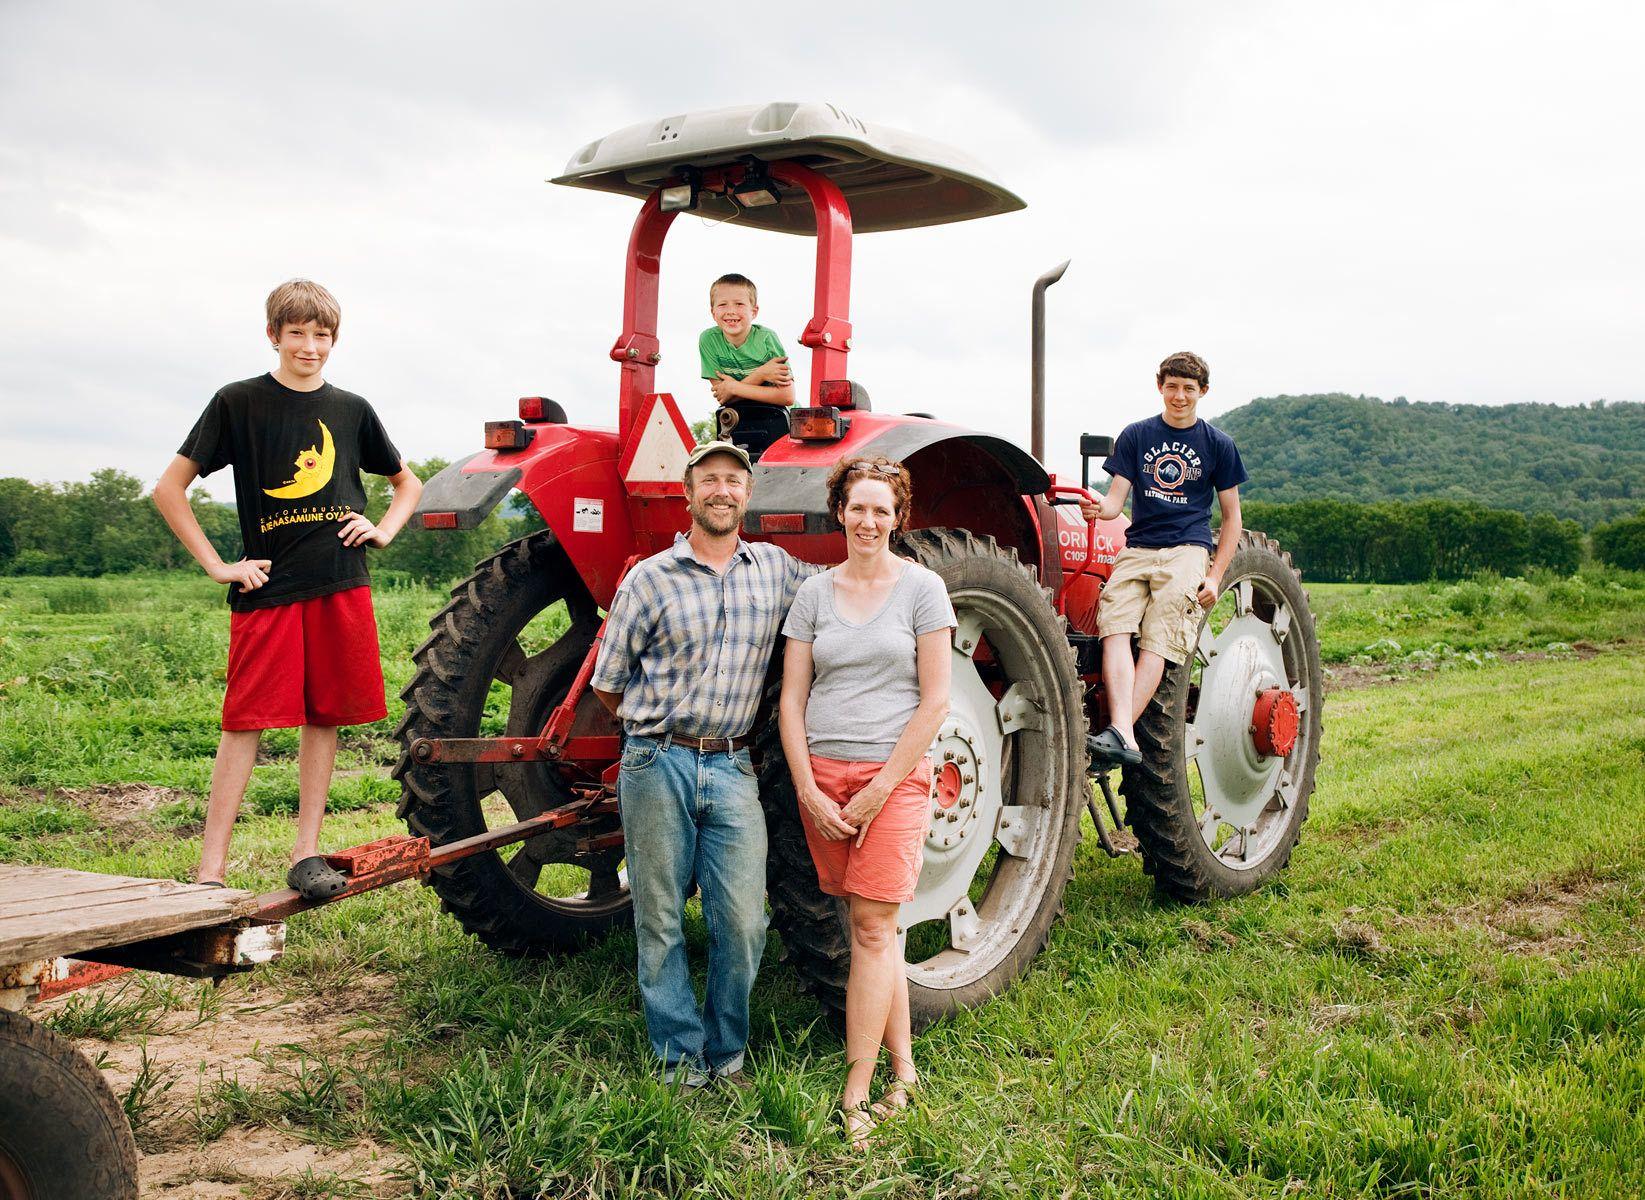 Jack Hedin, Jenni McHugh, and family, Altura, MN